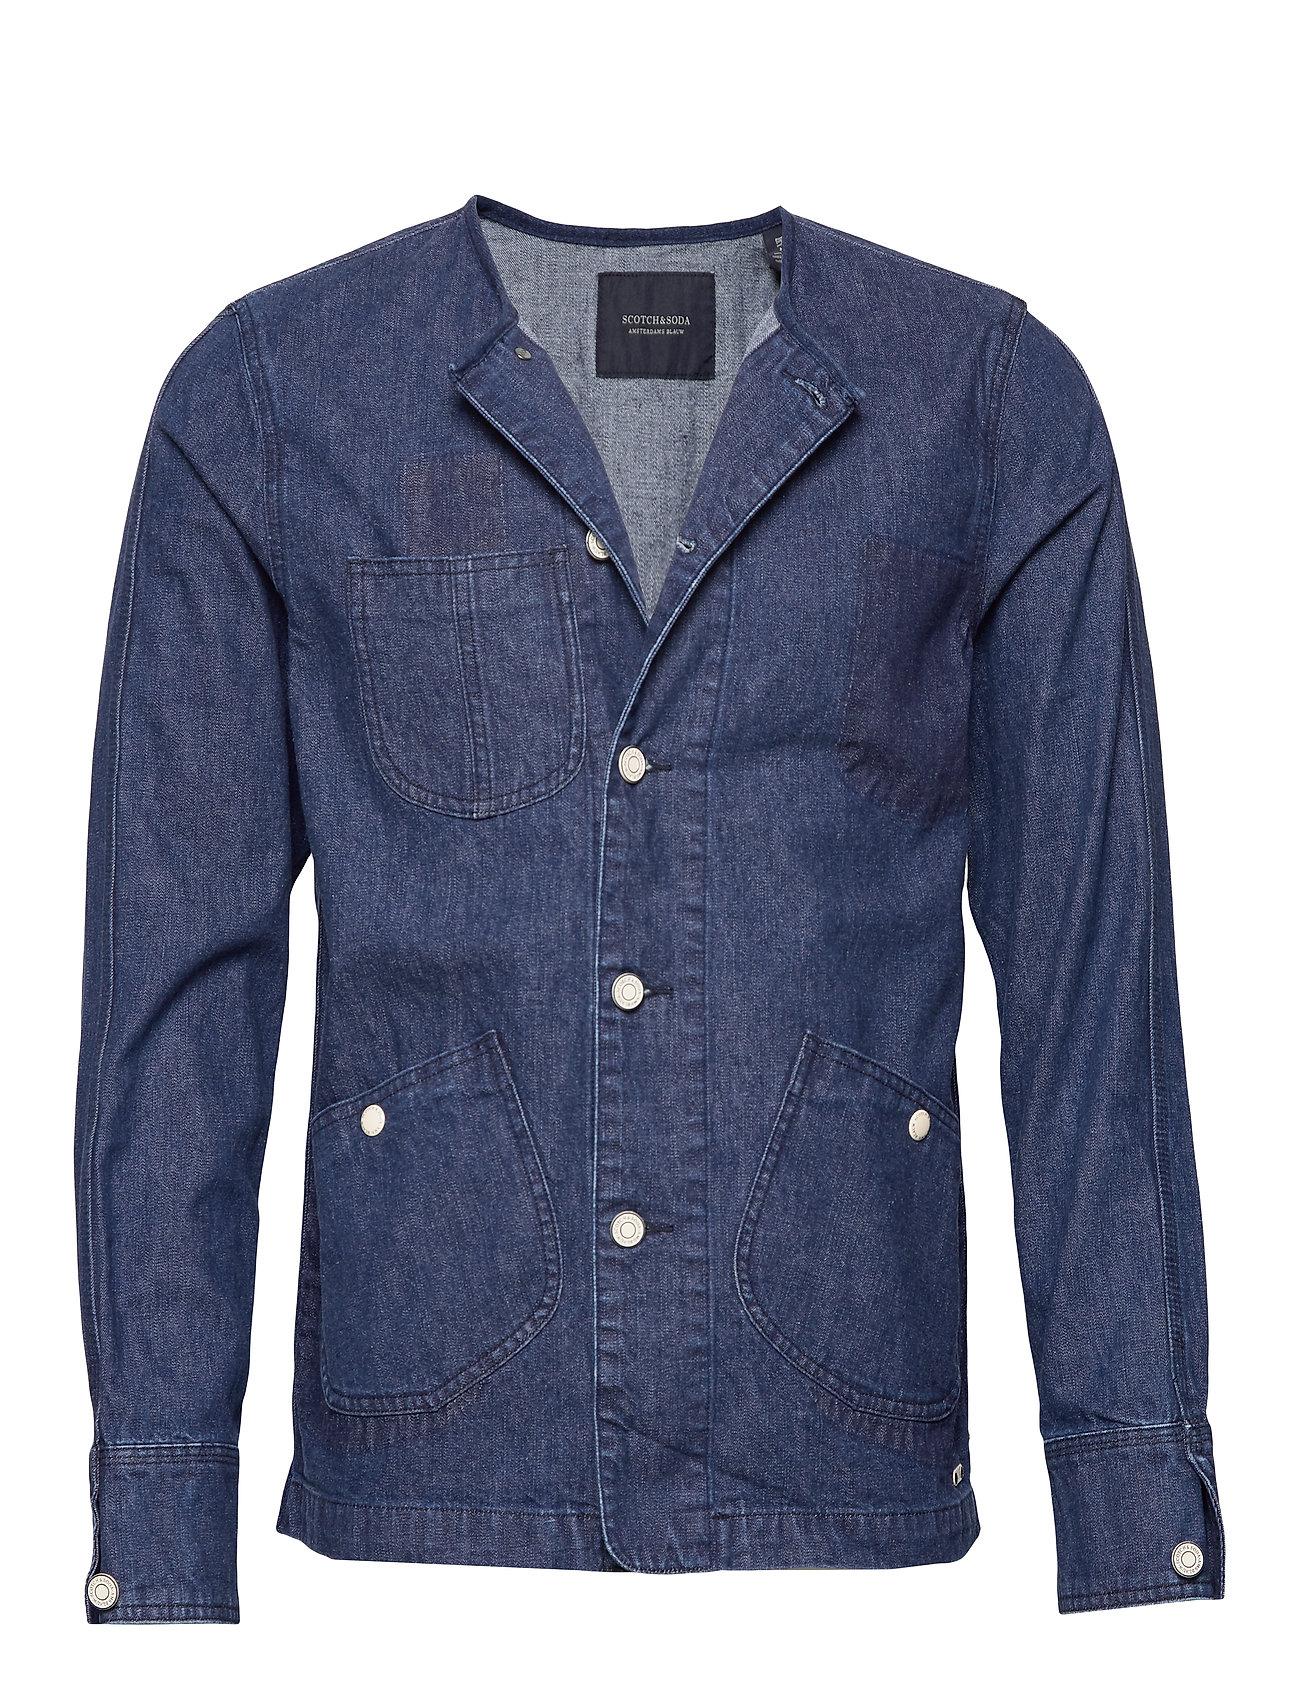 Scotch & Soda Ams Blauw matchy matchy tailored workwear jacket - INDIGO